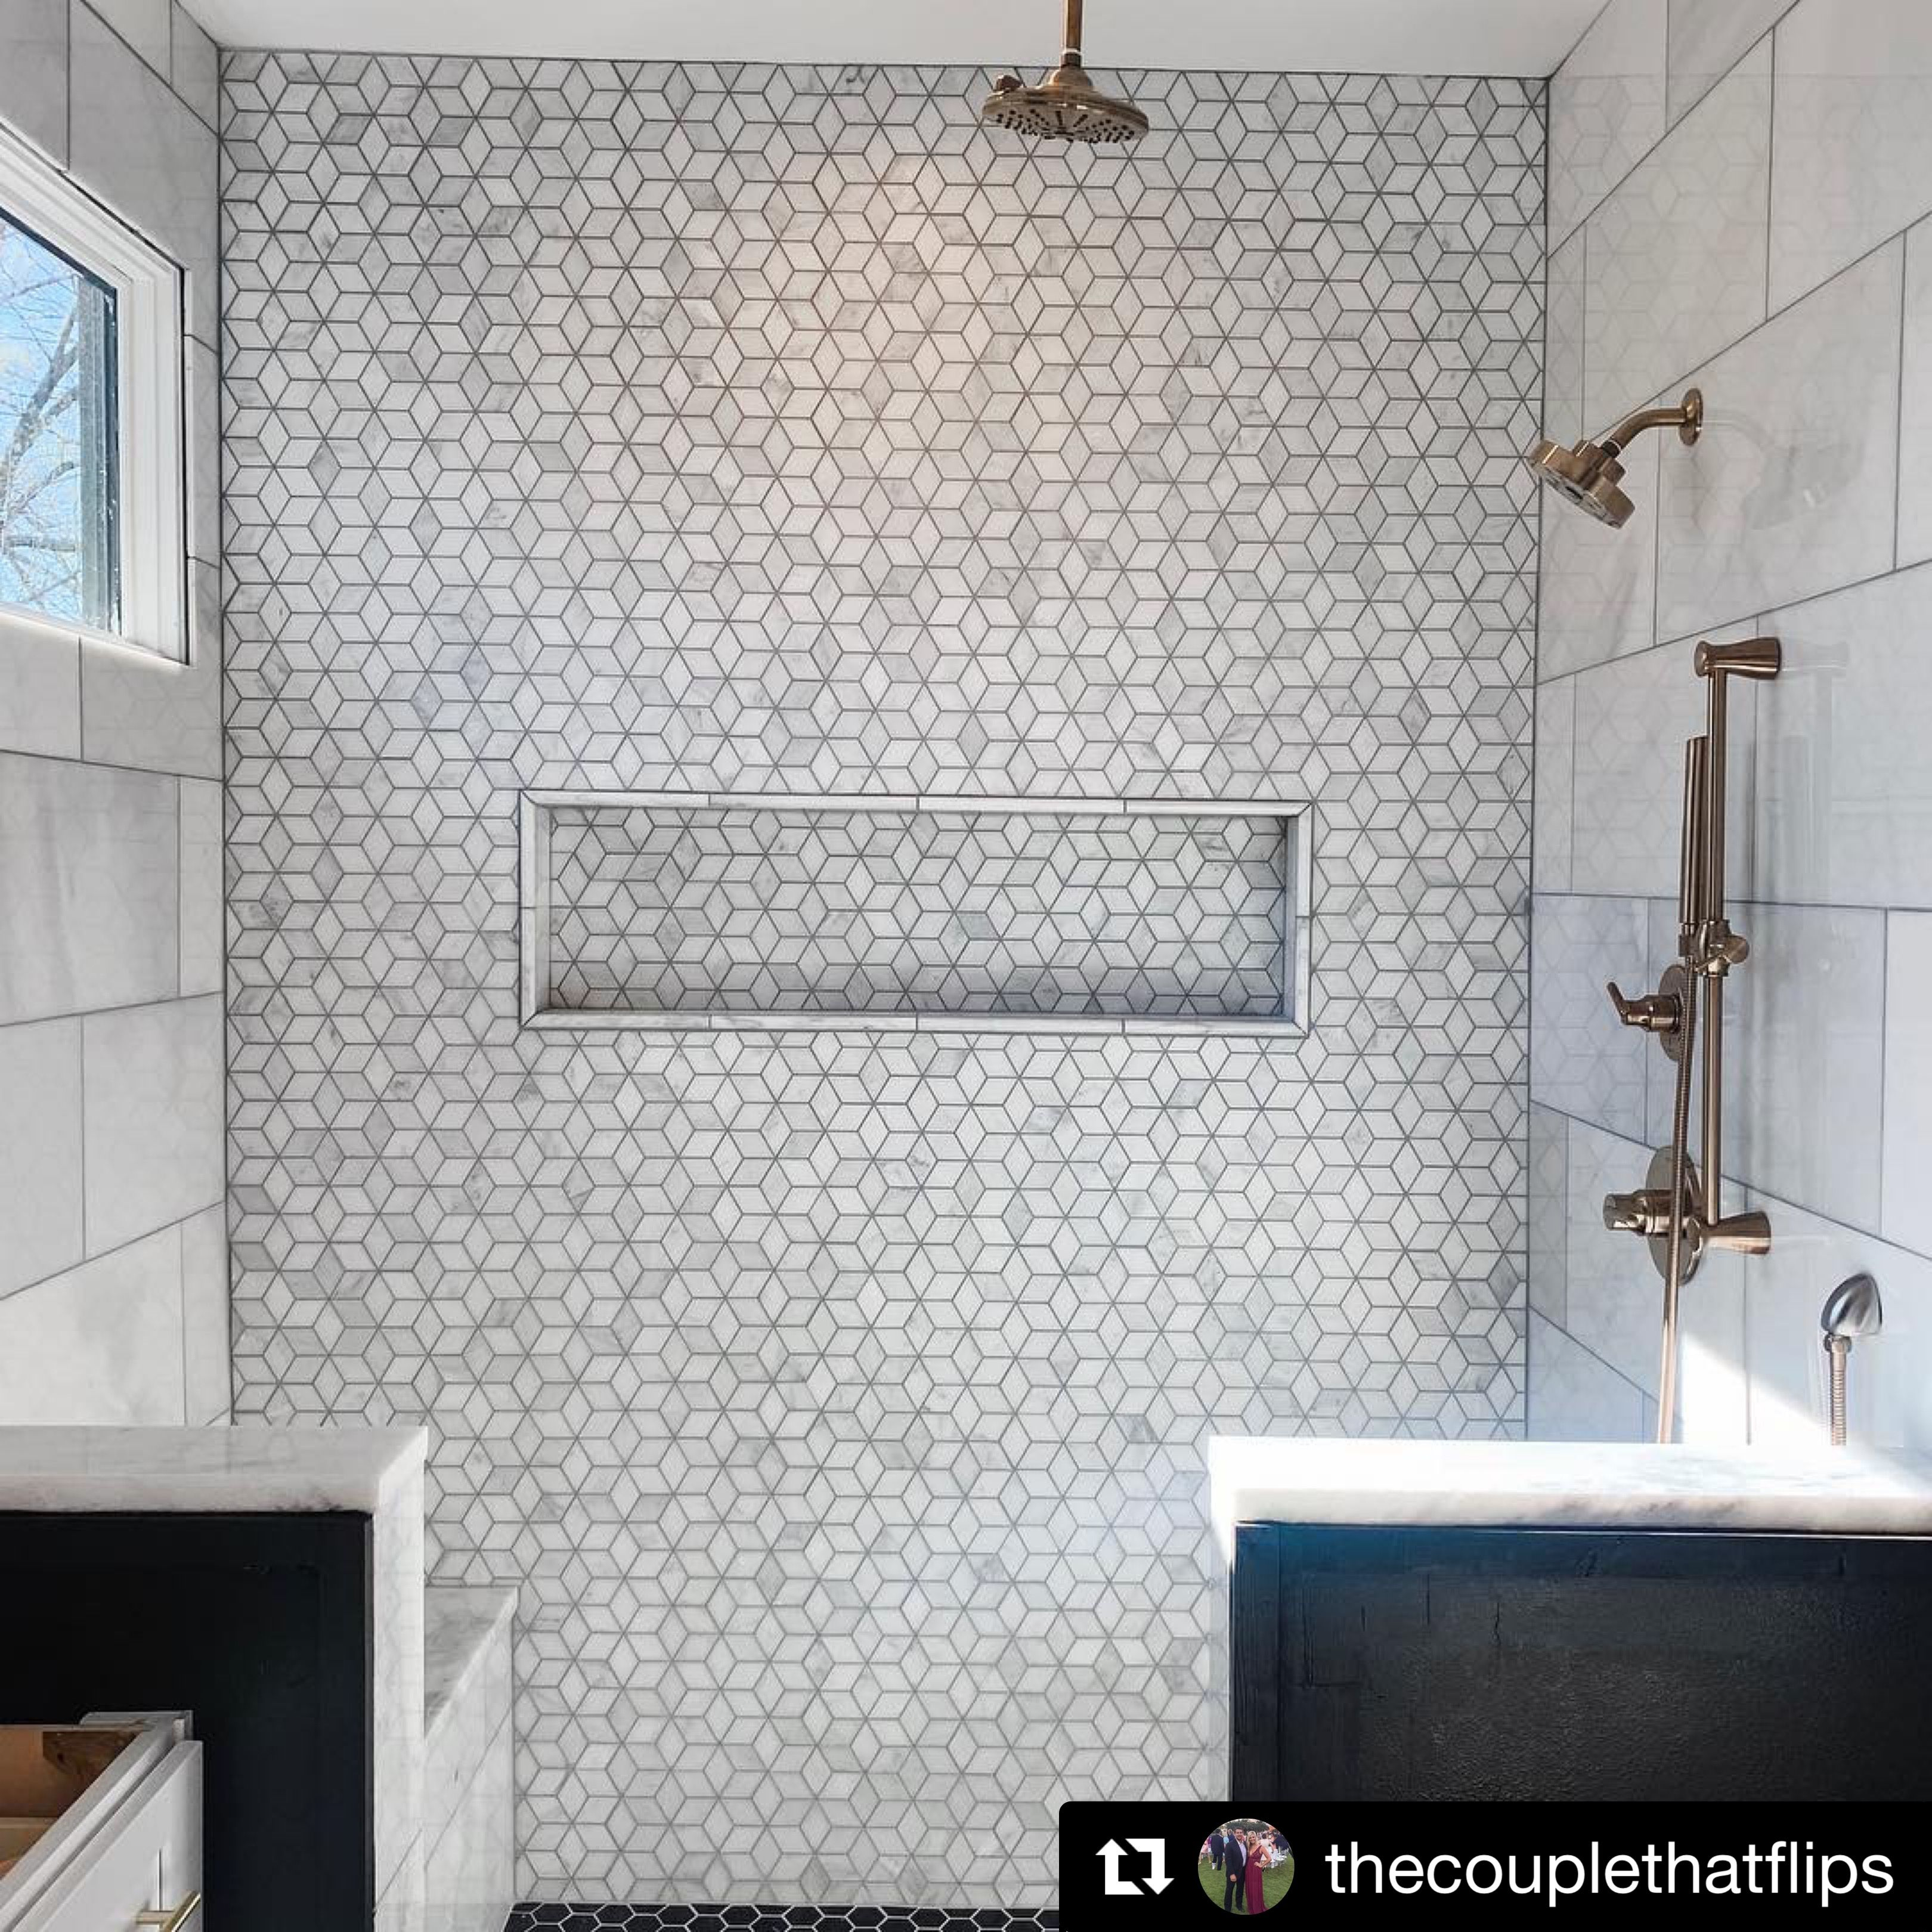 Riad Tile Casablanca Carrara Marble Diamond Bathroom Decor Colors Marble Bathroom Bathroom Decor